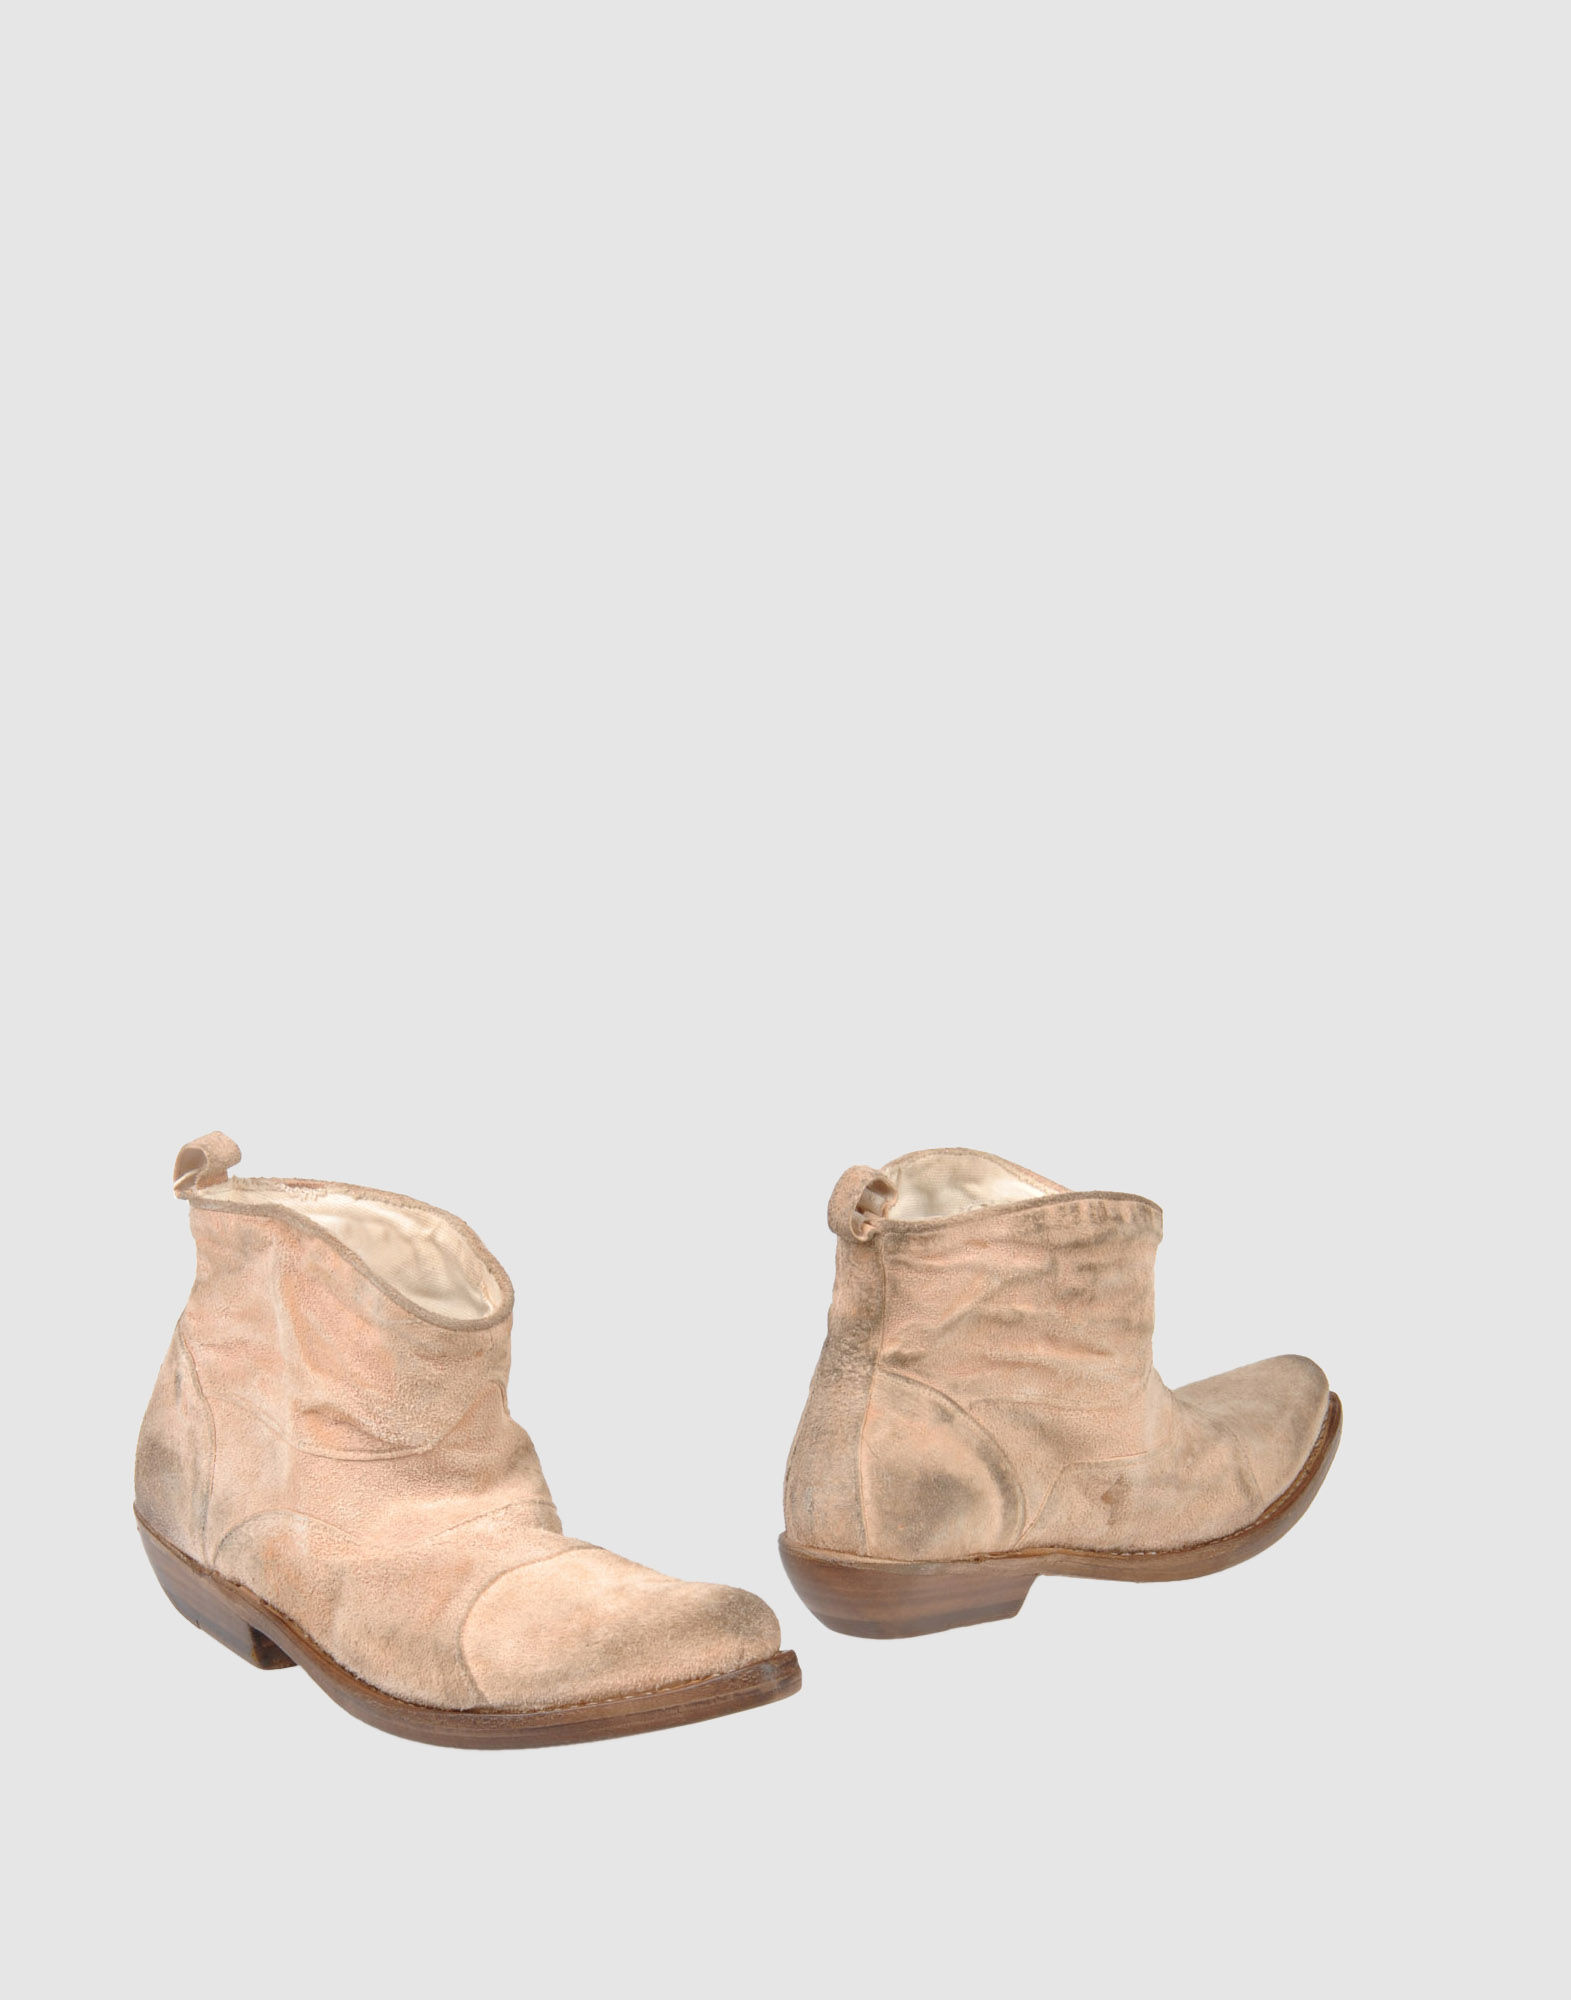 PANETULIPANI Полусапоги и высокие ботинки crocs полусапоги и высокие ботинки